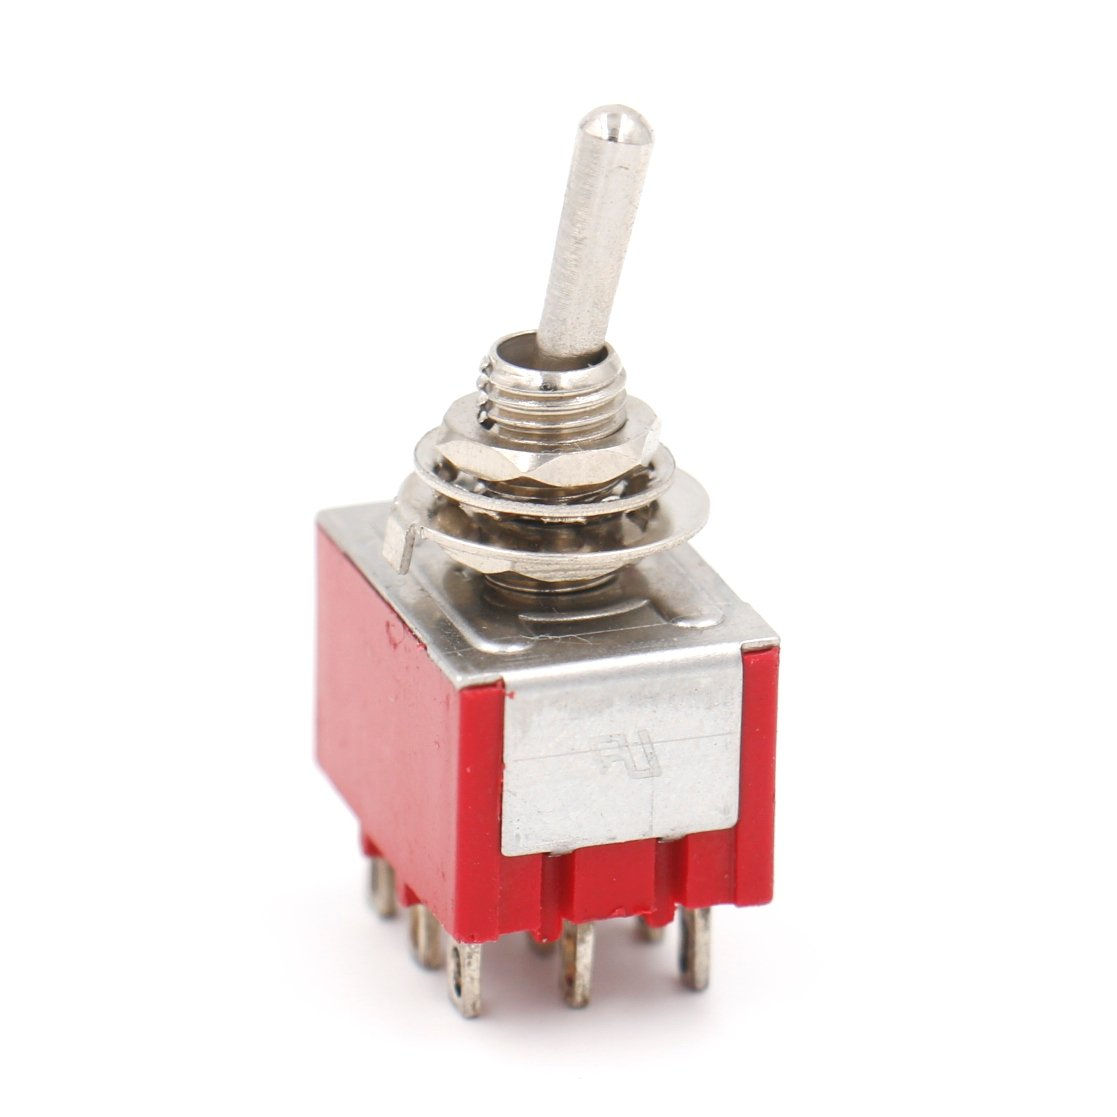 Heschen miniature Interrupteur /à bascule MTS-302/On-on 3pdt 9/broches 6/A 125/V Lot de 2 2/A 250/V UR /Énum/ér/és